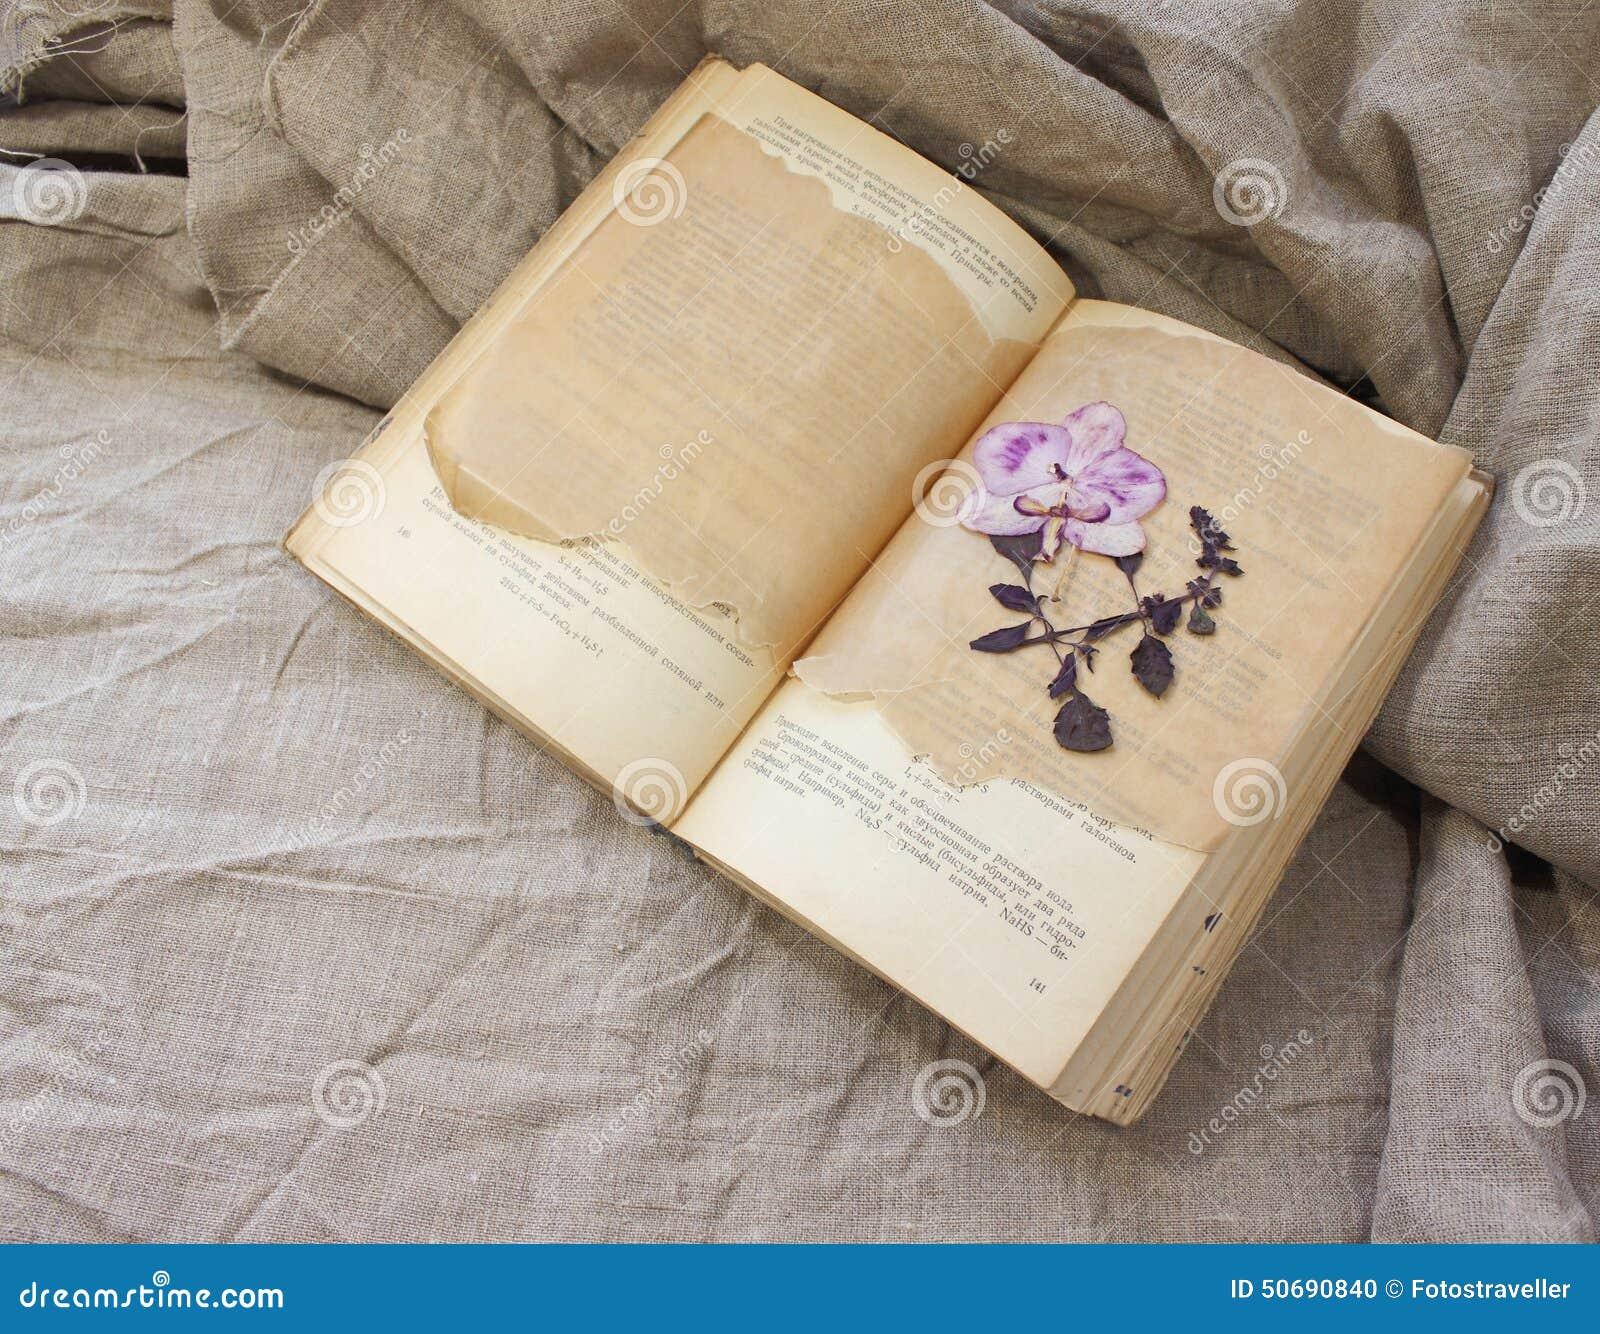 Download 书的干燥标本集 库存照片. 图片 包括有 精确度, 自治权, 非常好, 时间, 生活, 钉书匠, 过去, 仍然 - 50690840